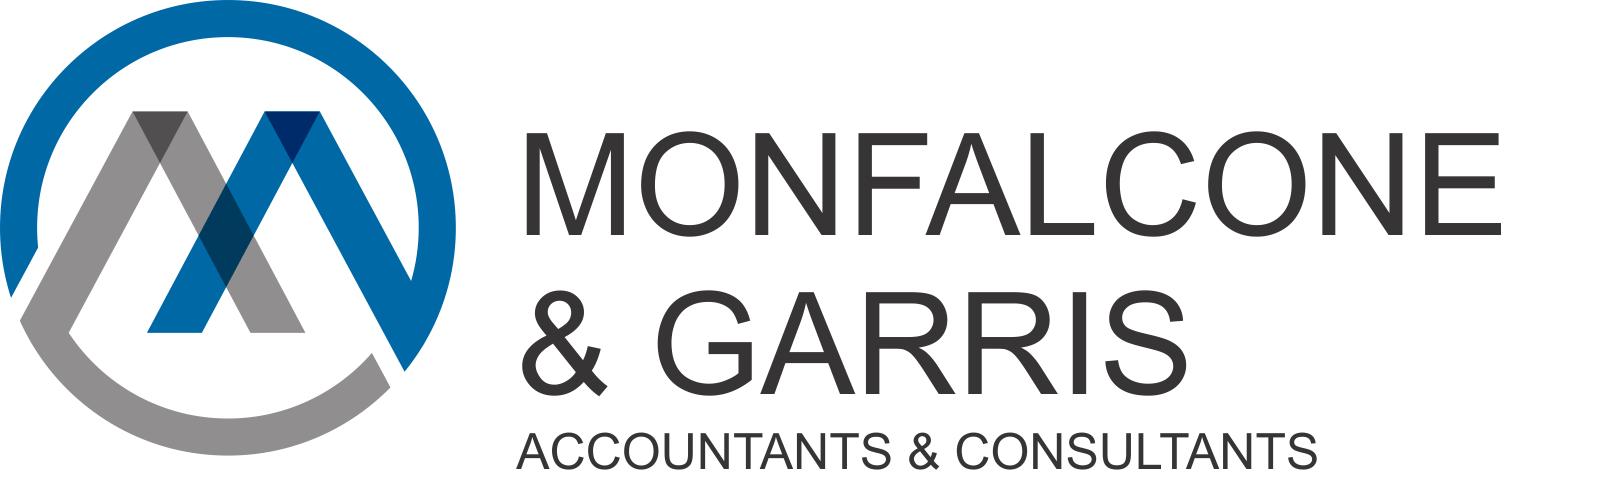 https://mag-cpas.com/wp-content/uploads/2015/09/Monfalcone-Garris-logo.png